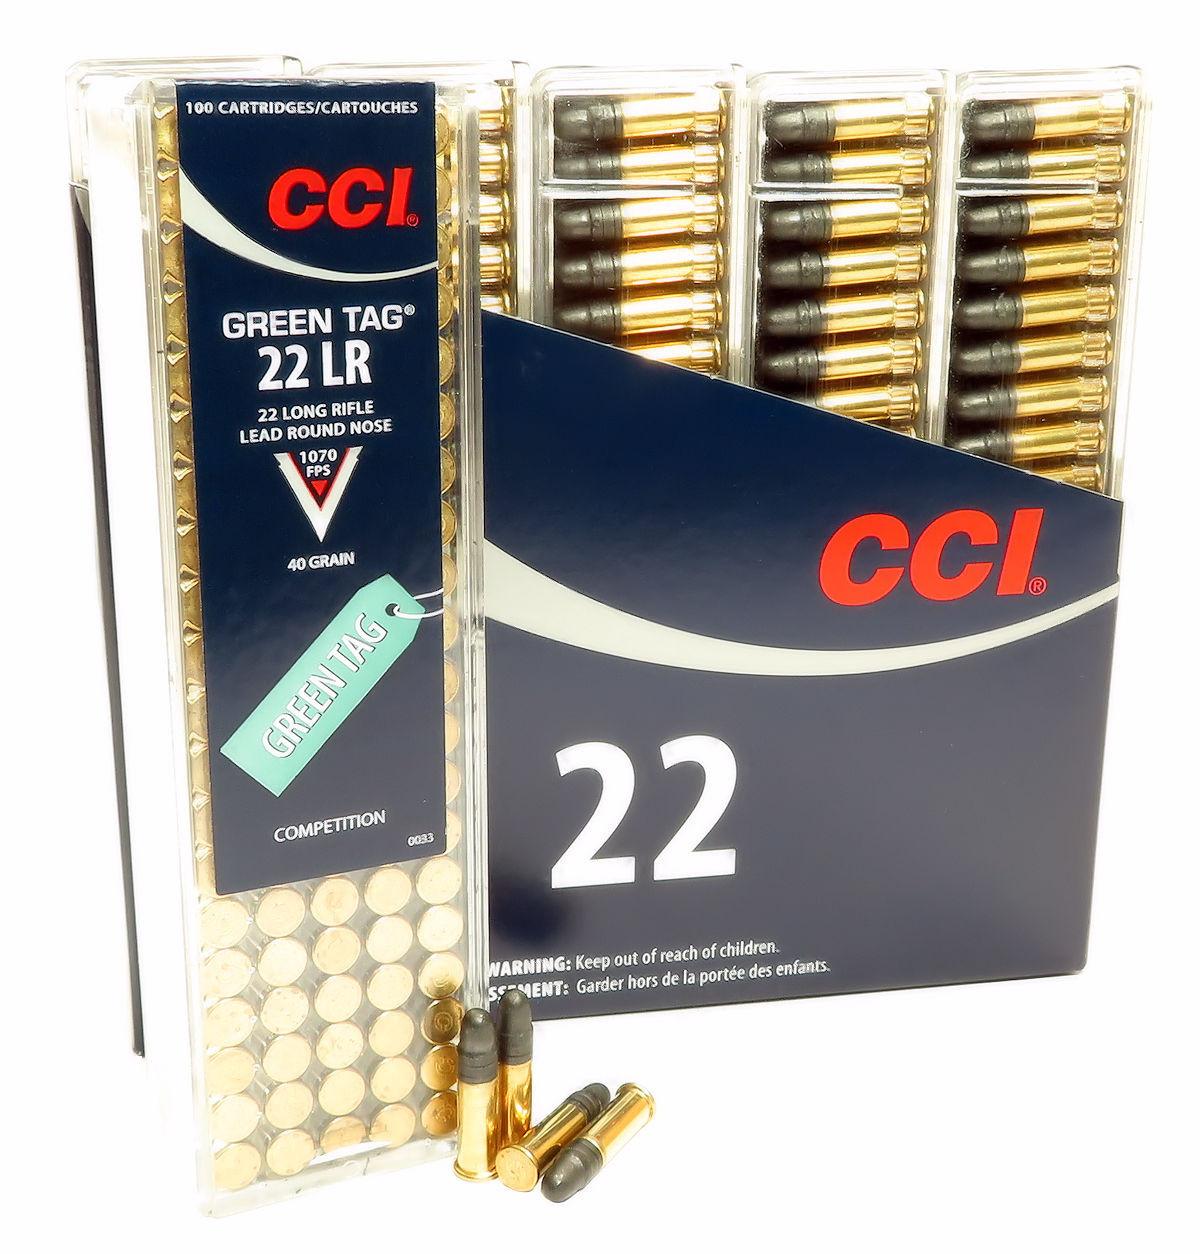 22lr ammo cci green tag competition 40gr lrn 0033 500 round box